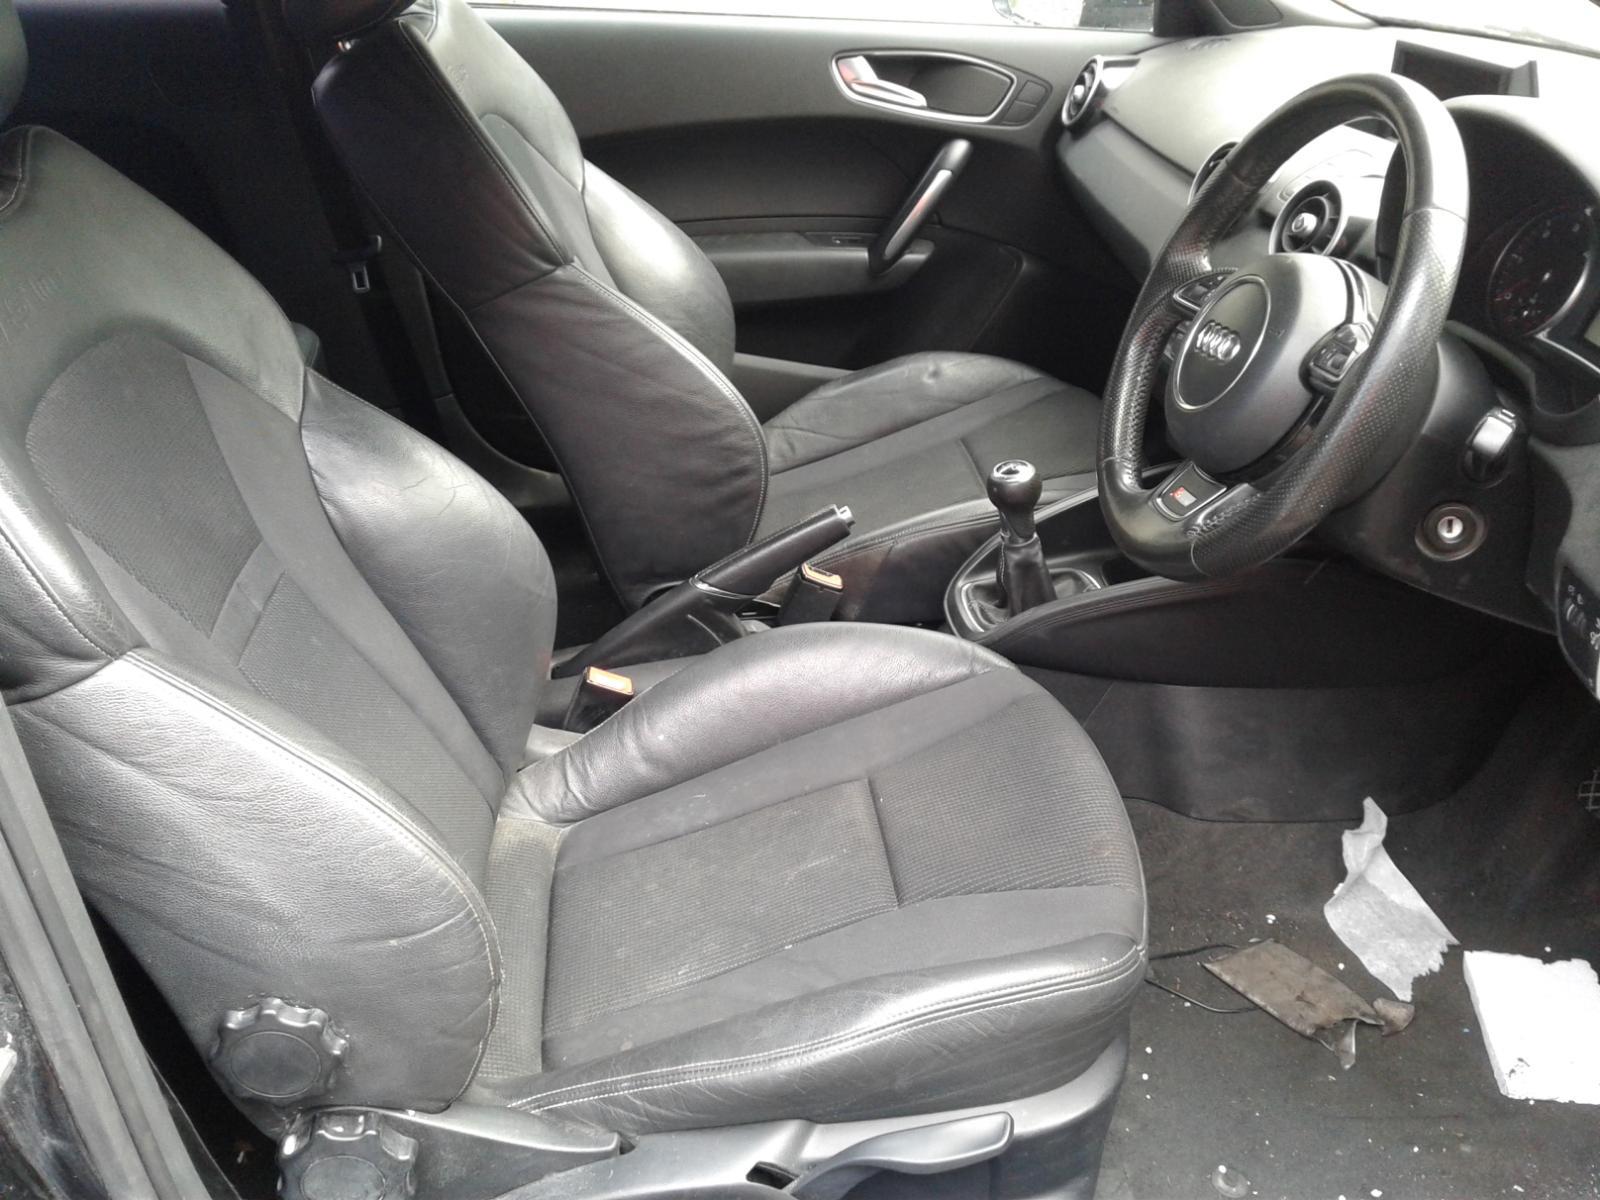 View Auto part AUDI A1 2012 3 Door Hatchback